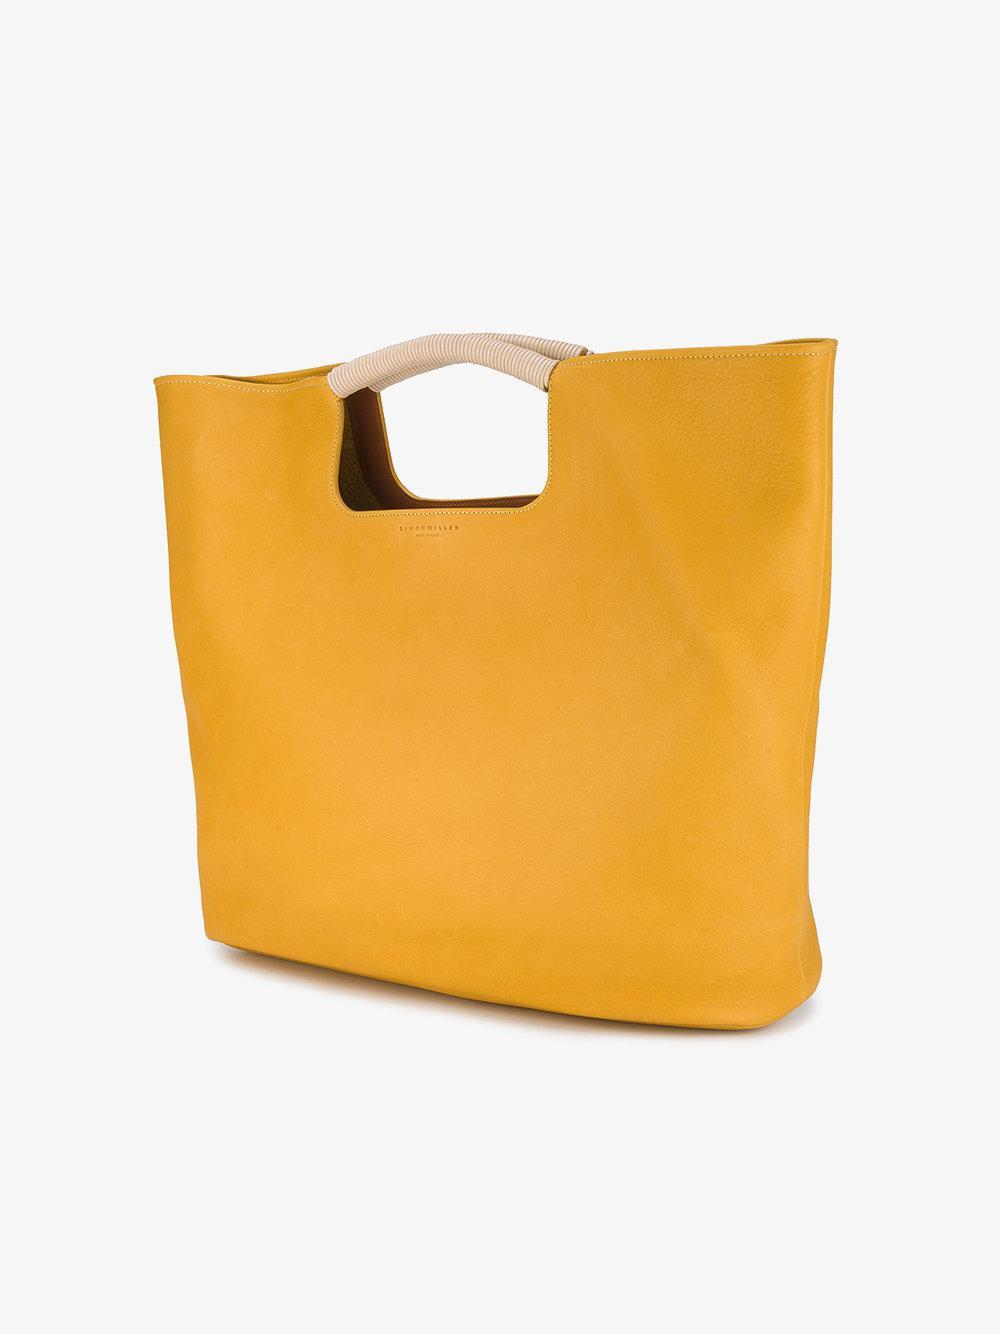 Simon Miller Leather Large Birch Tote Bag in Yellow & Orange (Yellow)